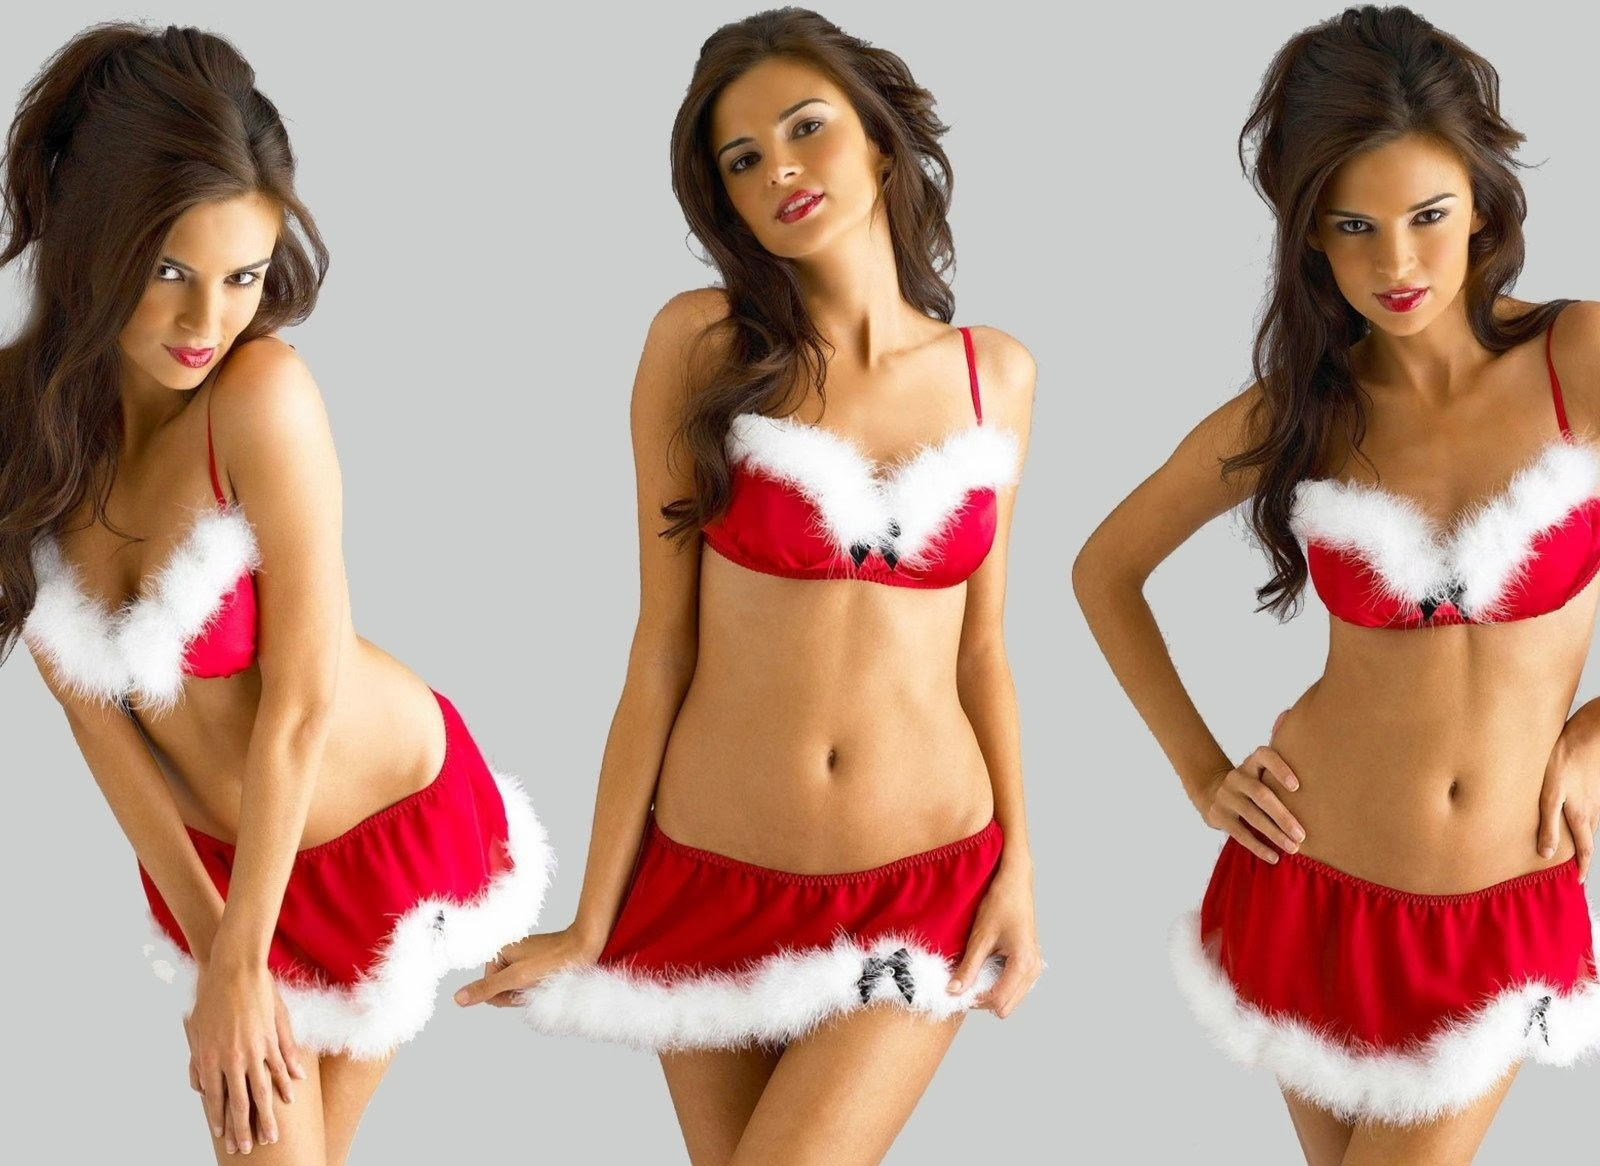 christmas girls new hot wallpaper 2013 2014 porn bikini sexy photography. Black Bedroom Furniture Sets. Home Design Ideas